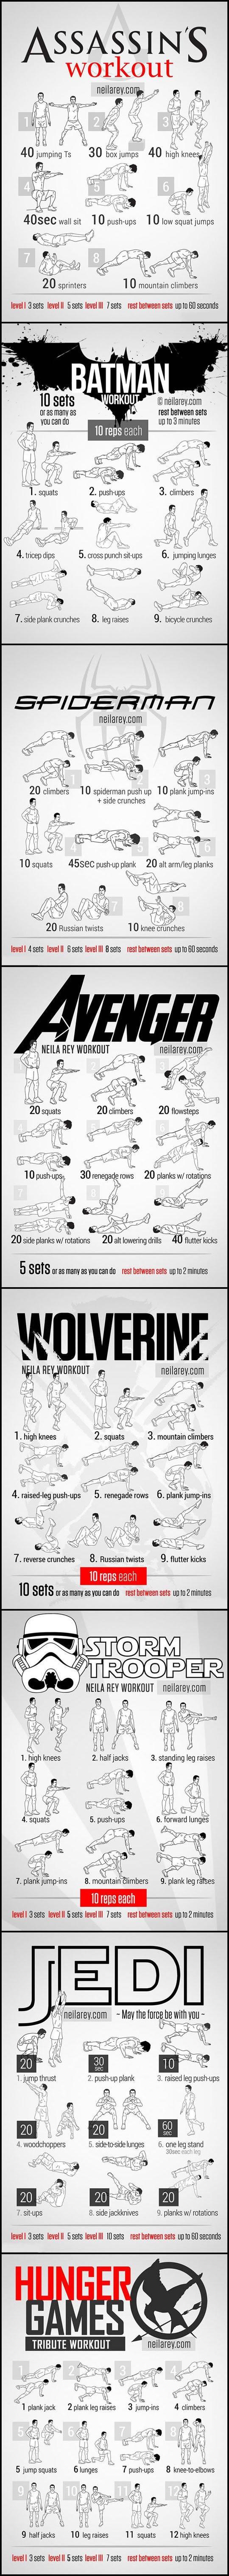 Superhero workouts